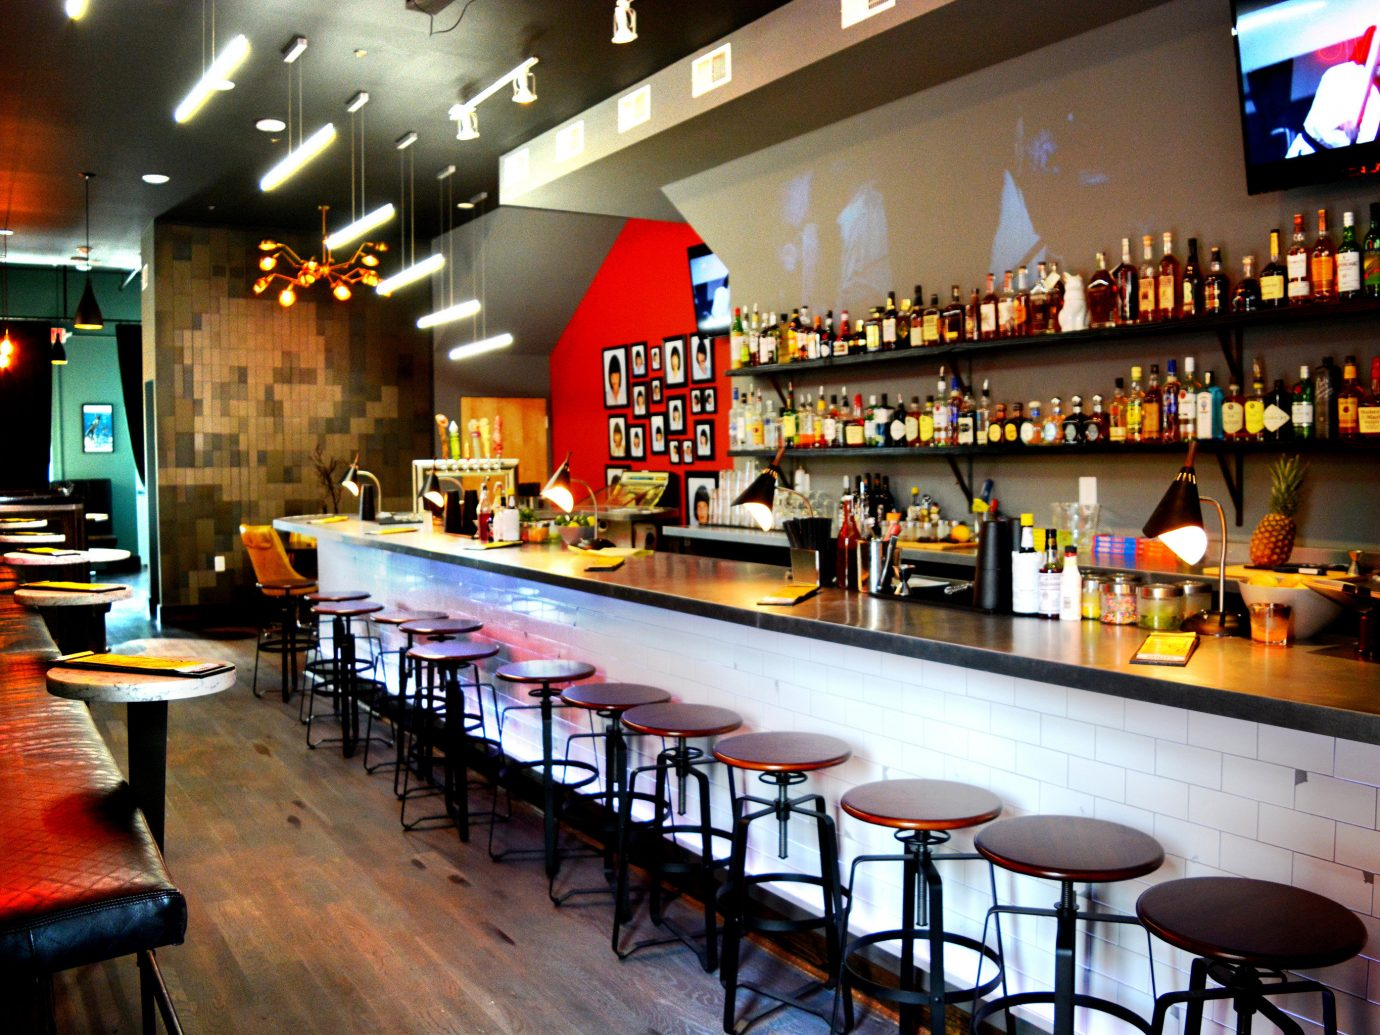 Boutique Hotels Fall Travel Trip Ideas Weekend Getaways indoor floor Bar restaurant interior design ceiling café fast food restaurant liquor store area Island